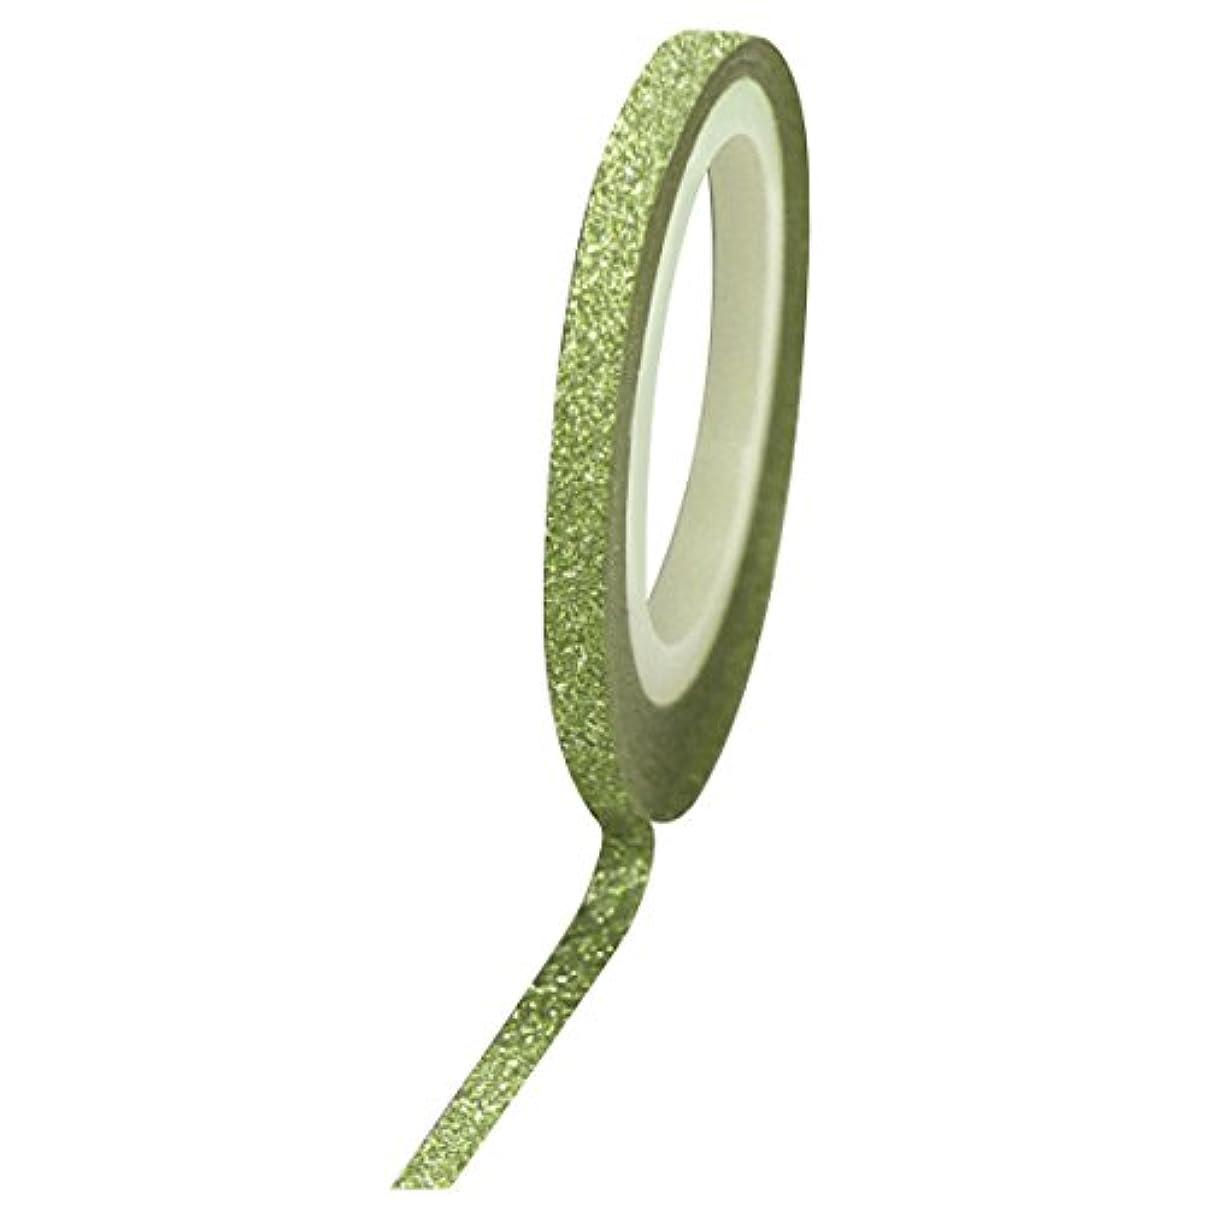 Bonnail グリッターラインテープ 3mm グリーンラメ